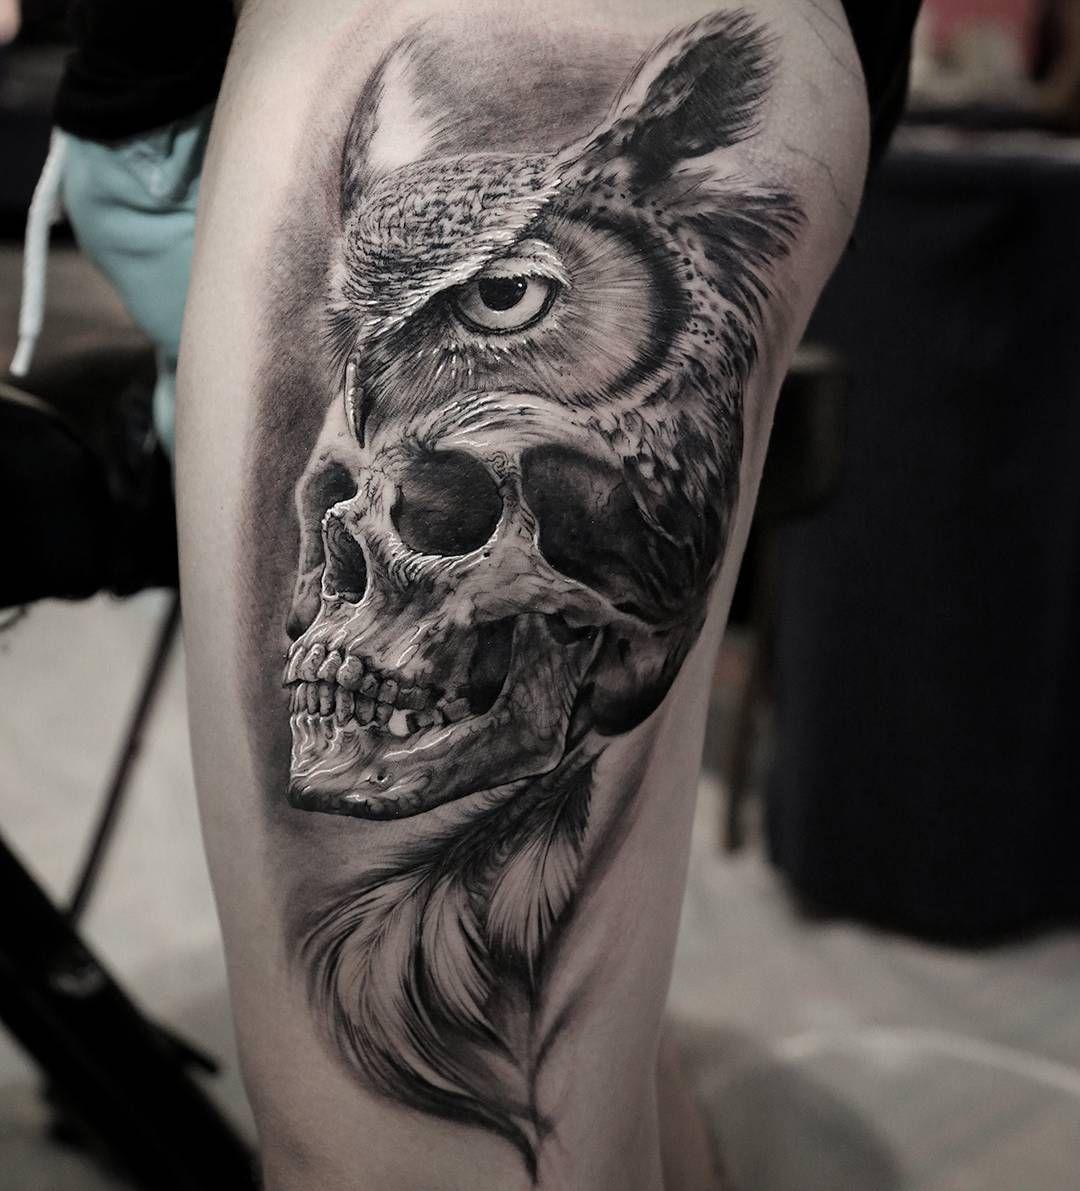 Stefano Alcantara Tattoo Realism From Peru Picture Tattoos